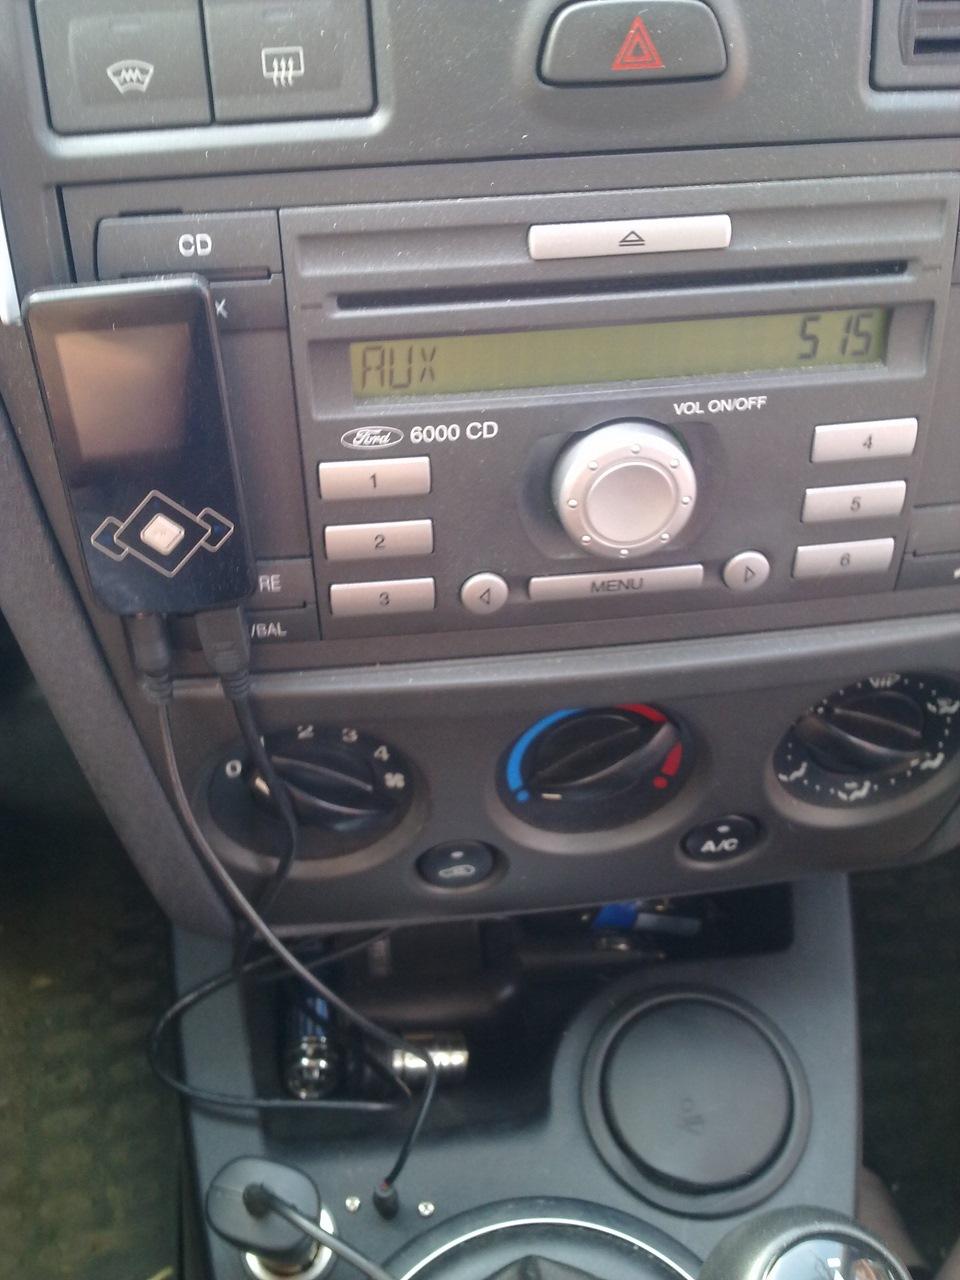 Хонда ЦР-В 2008, бензин, SUV (Кроссовер+Джип), 4вд, автомат